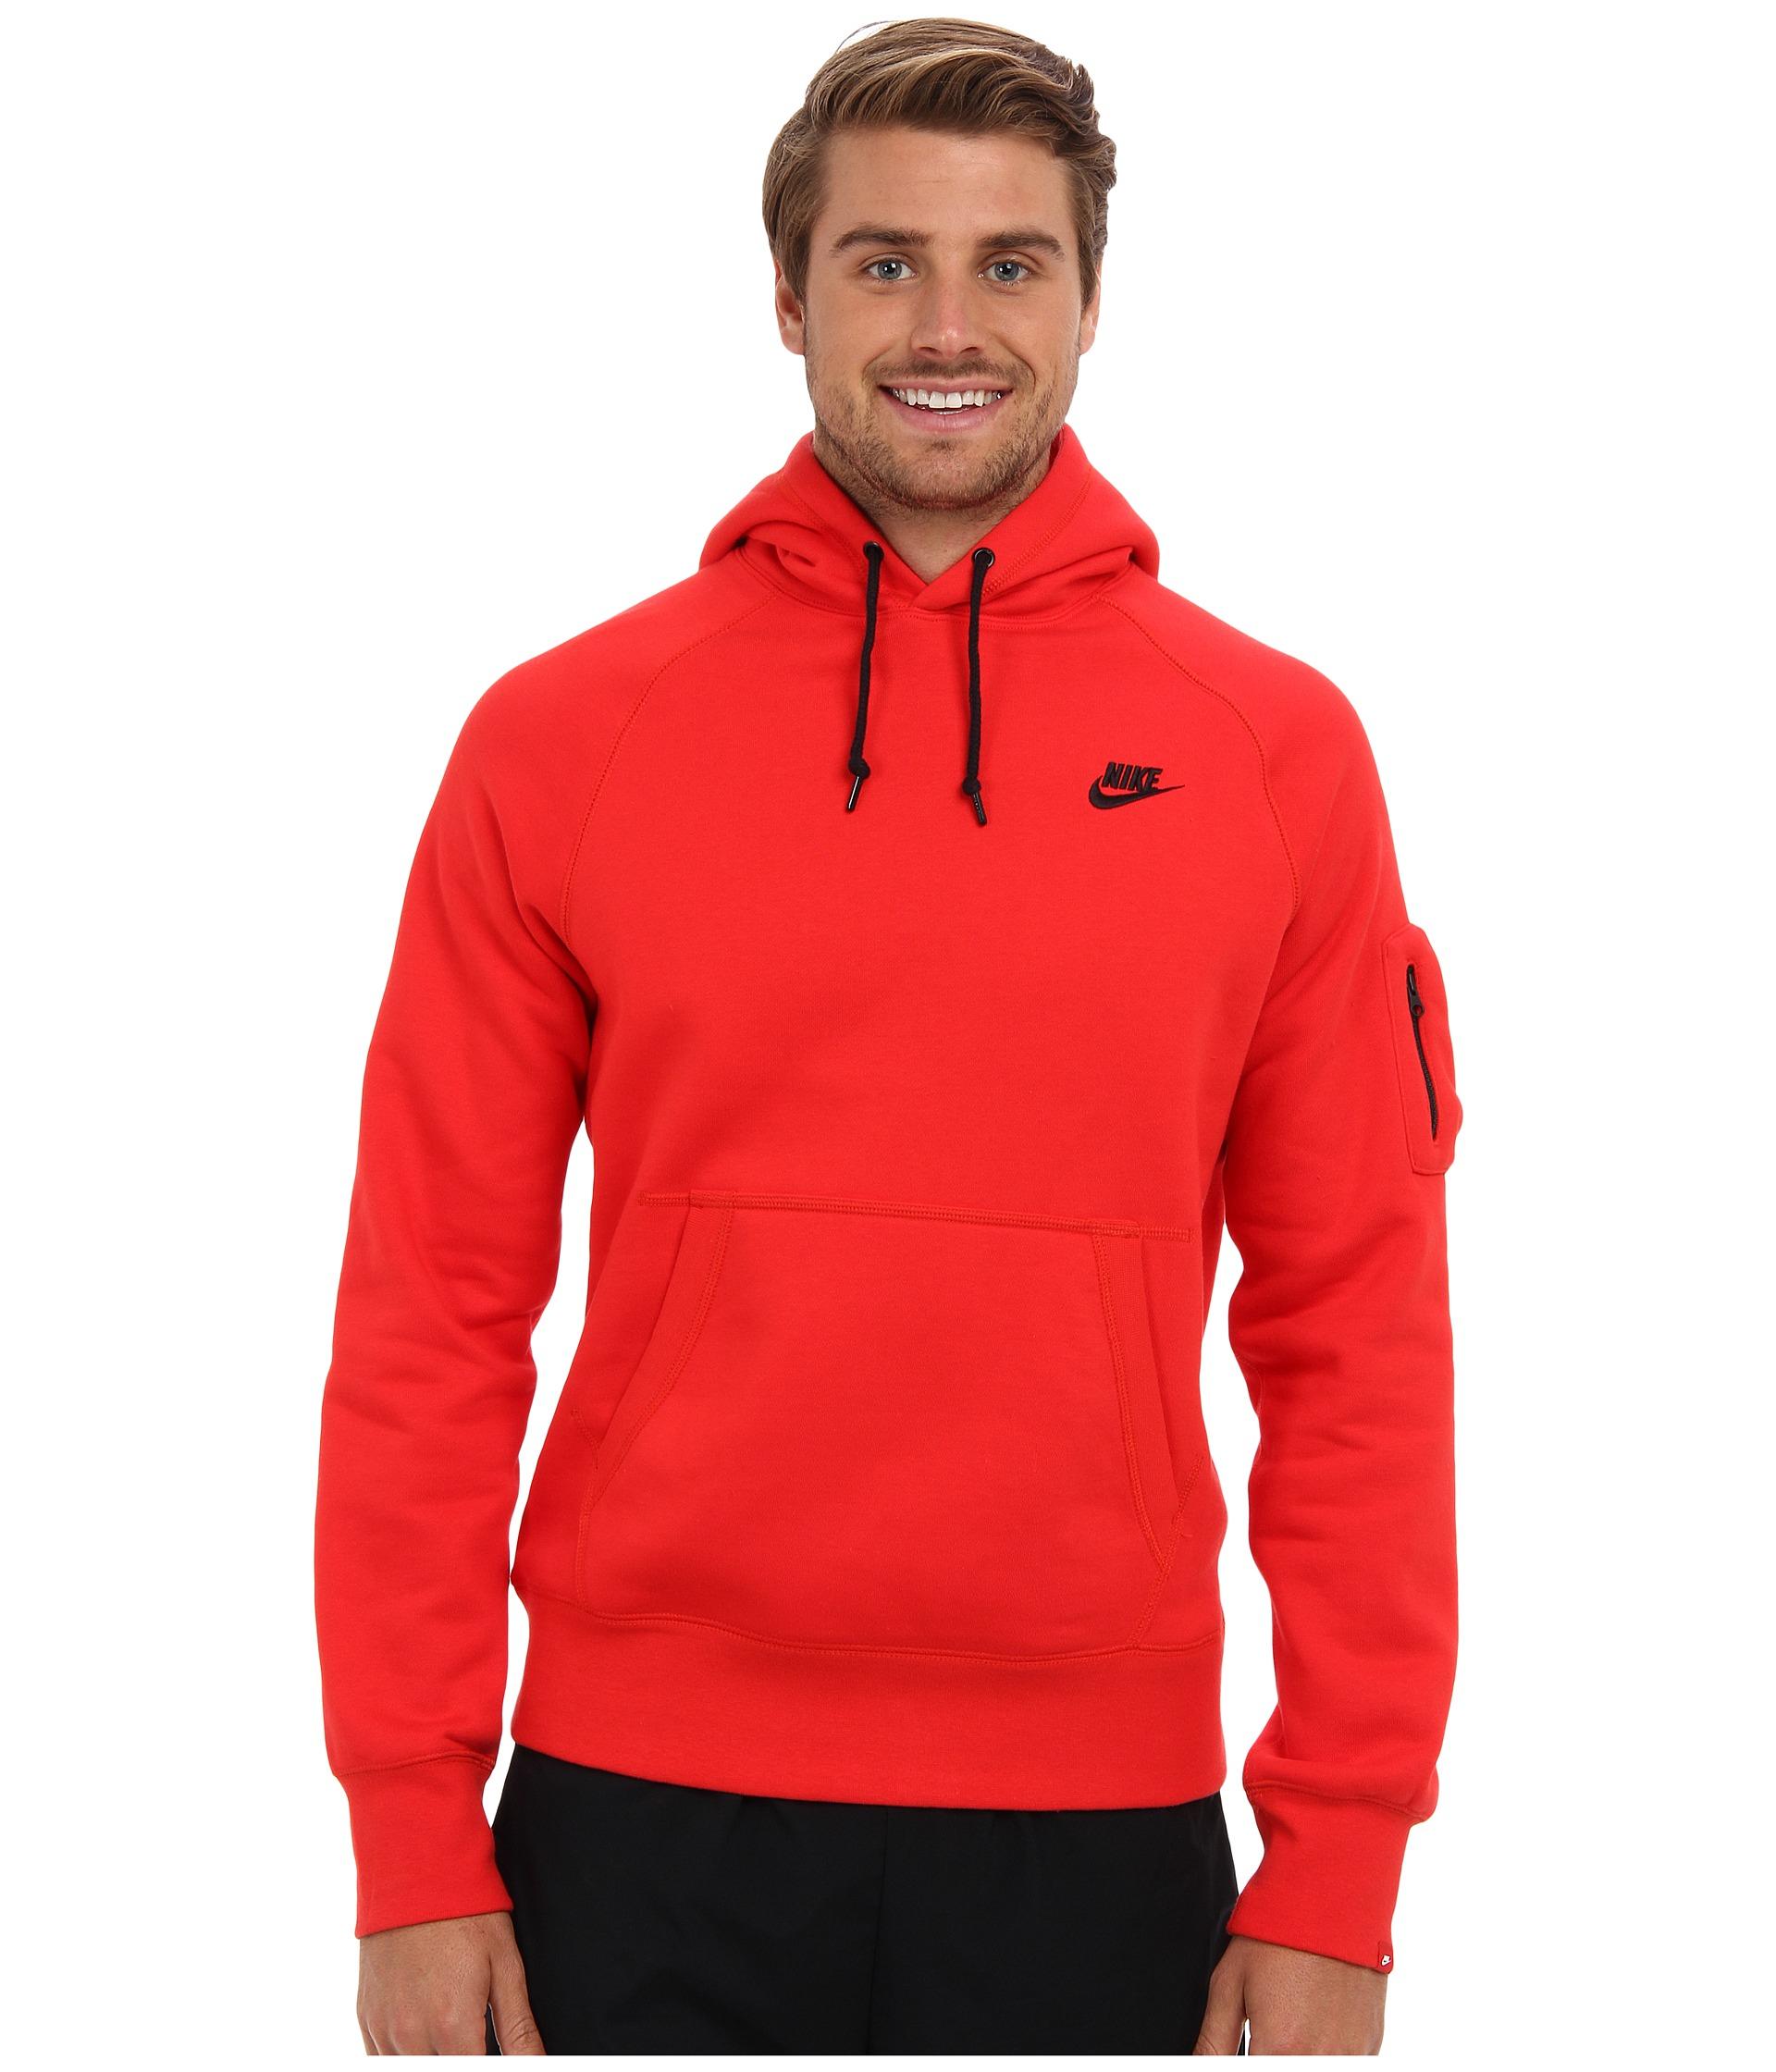 dfae4f139e23 Red Nike Crew Neck Sweatshirts